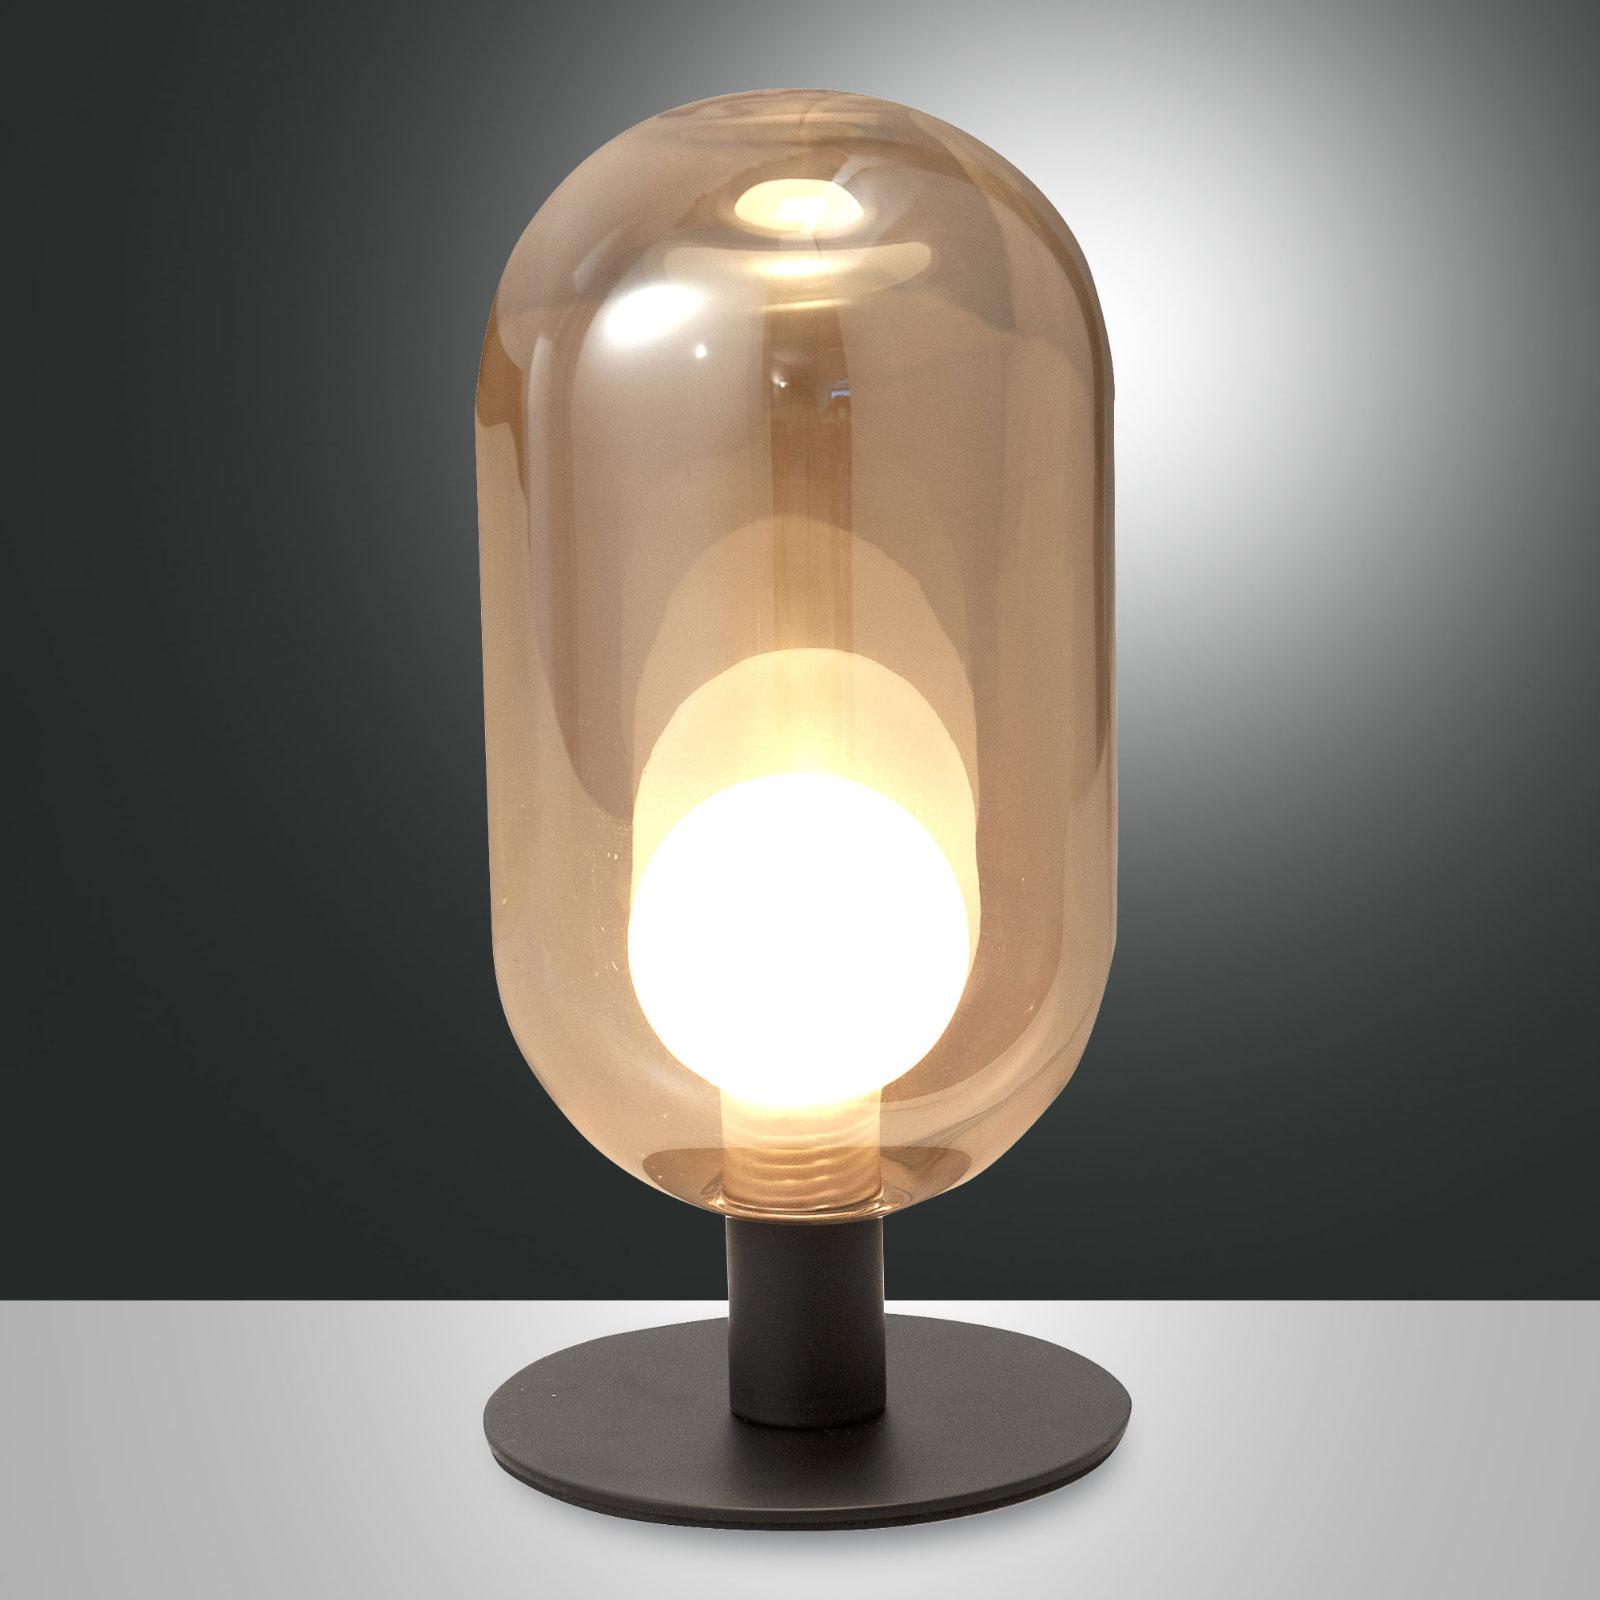 LED tafellamp Gubbio, ovale glazen kap, amber